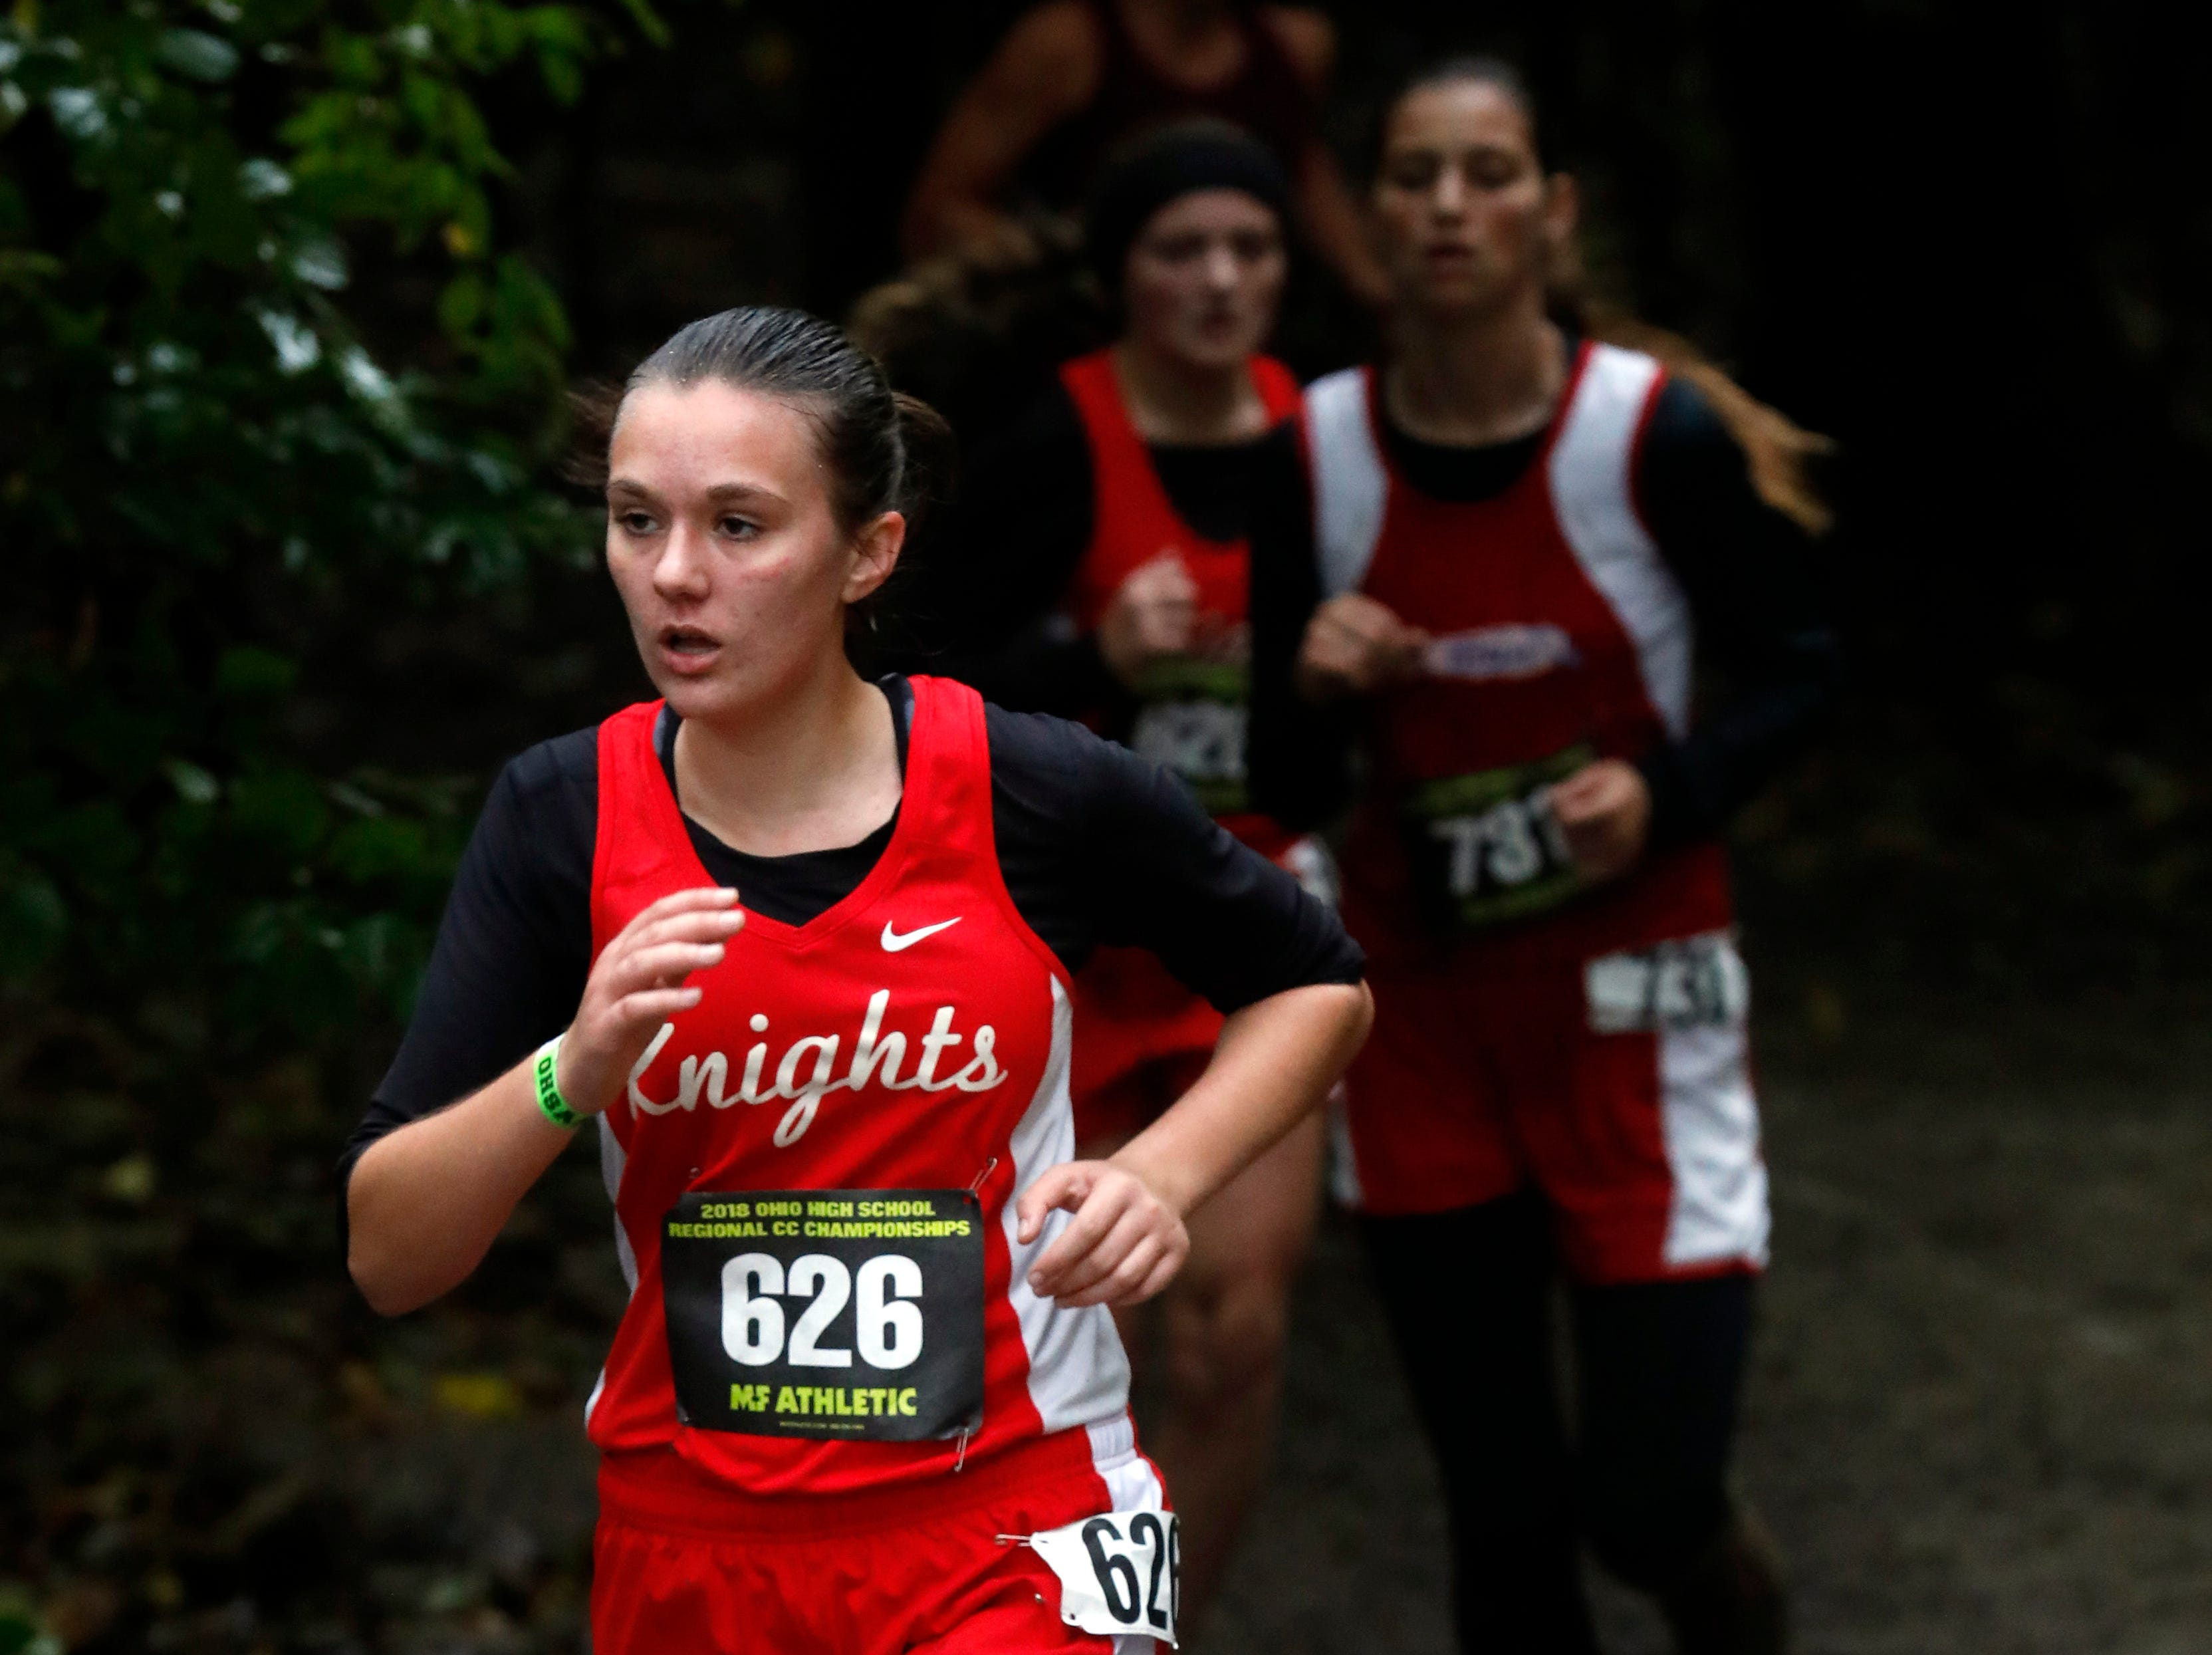 Fairfield Christian's Maggie Roberts runs in the Regional Cross Country meet Saturday, Oct. 27, 2018, at Pickerington North High School in Pickerington.